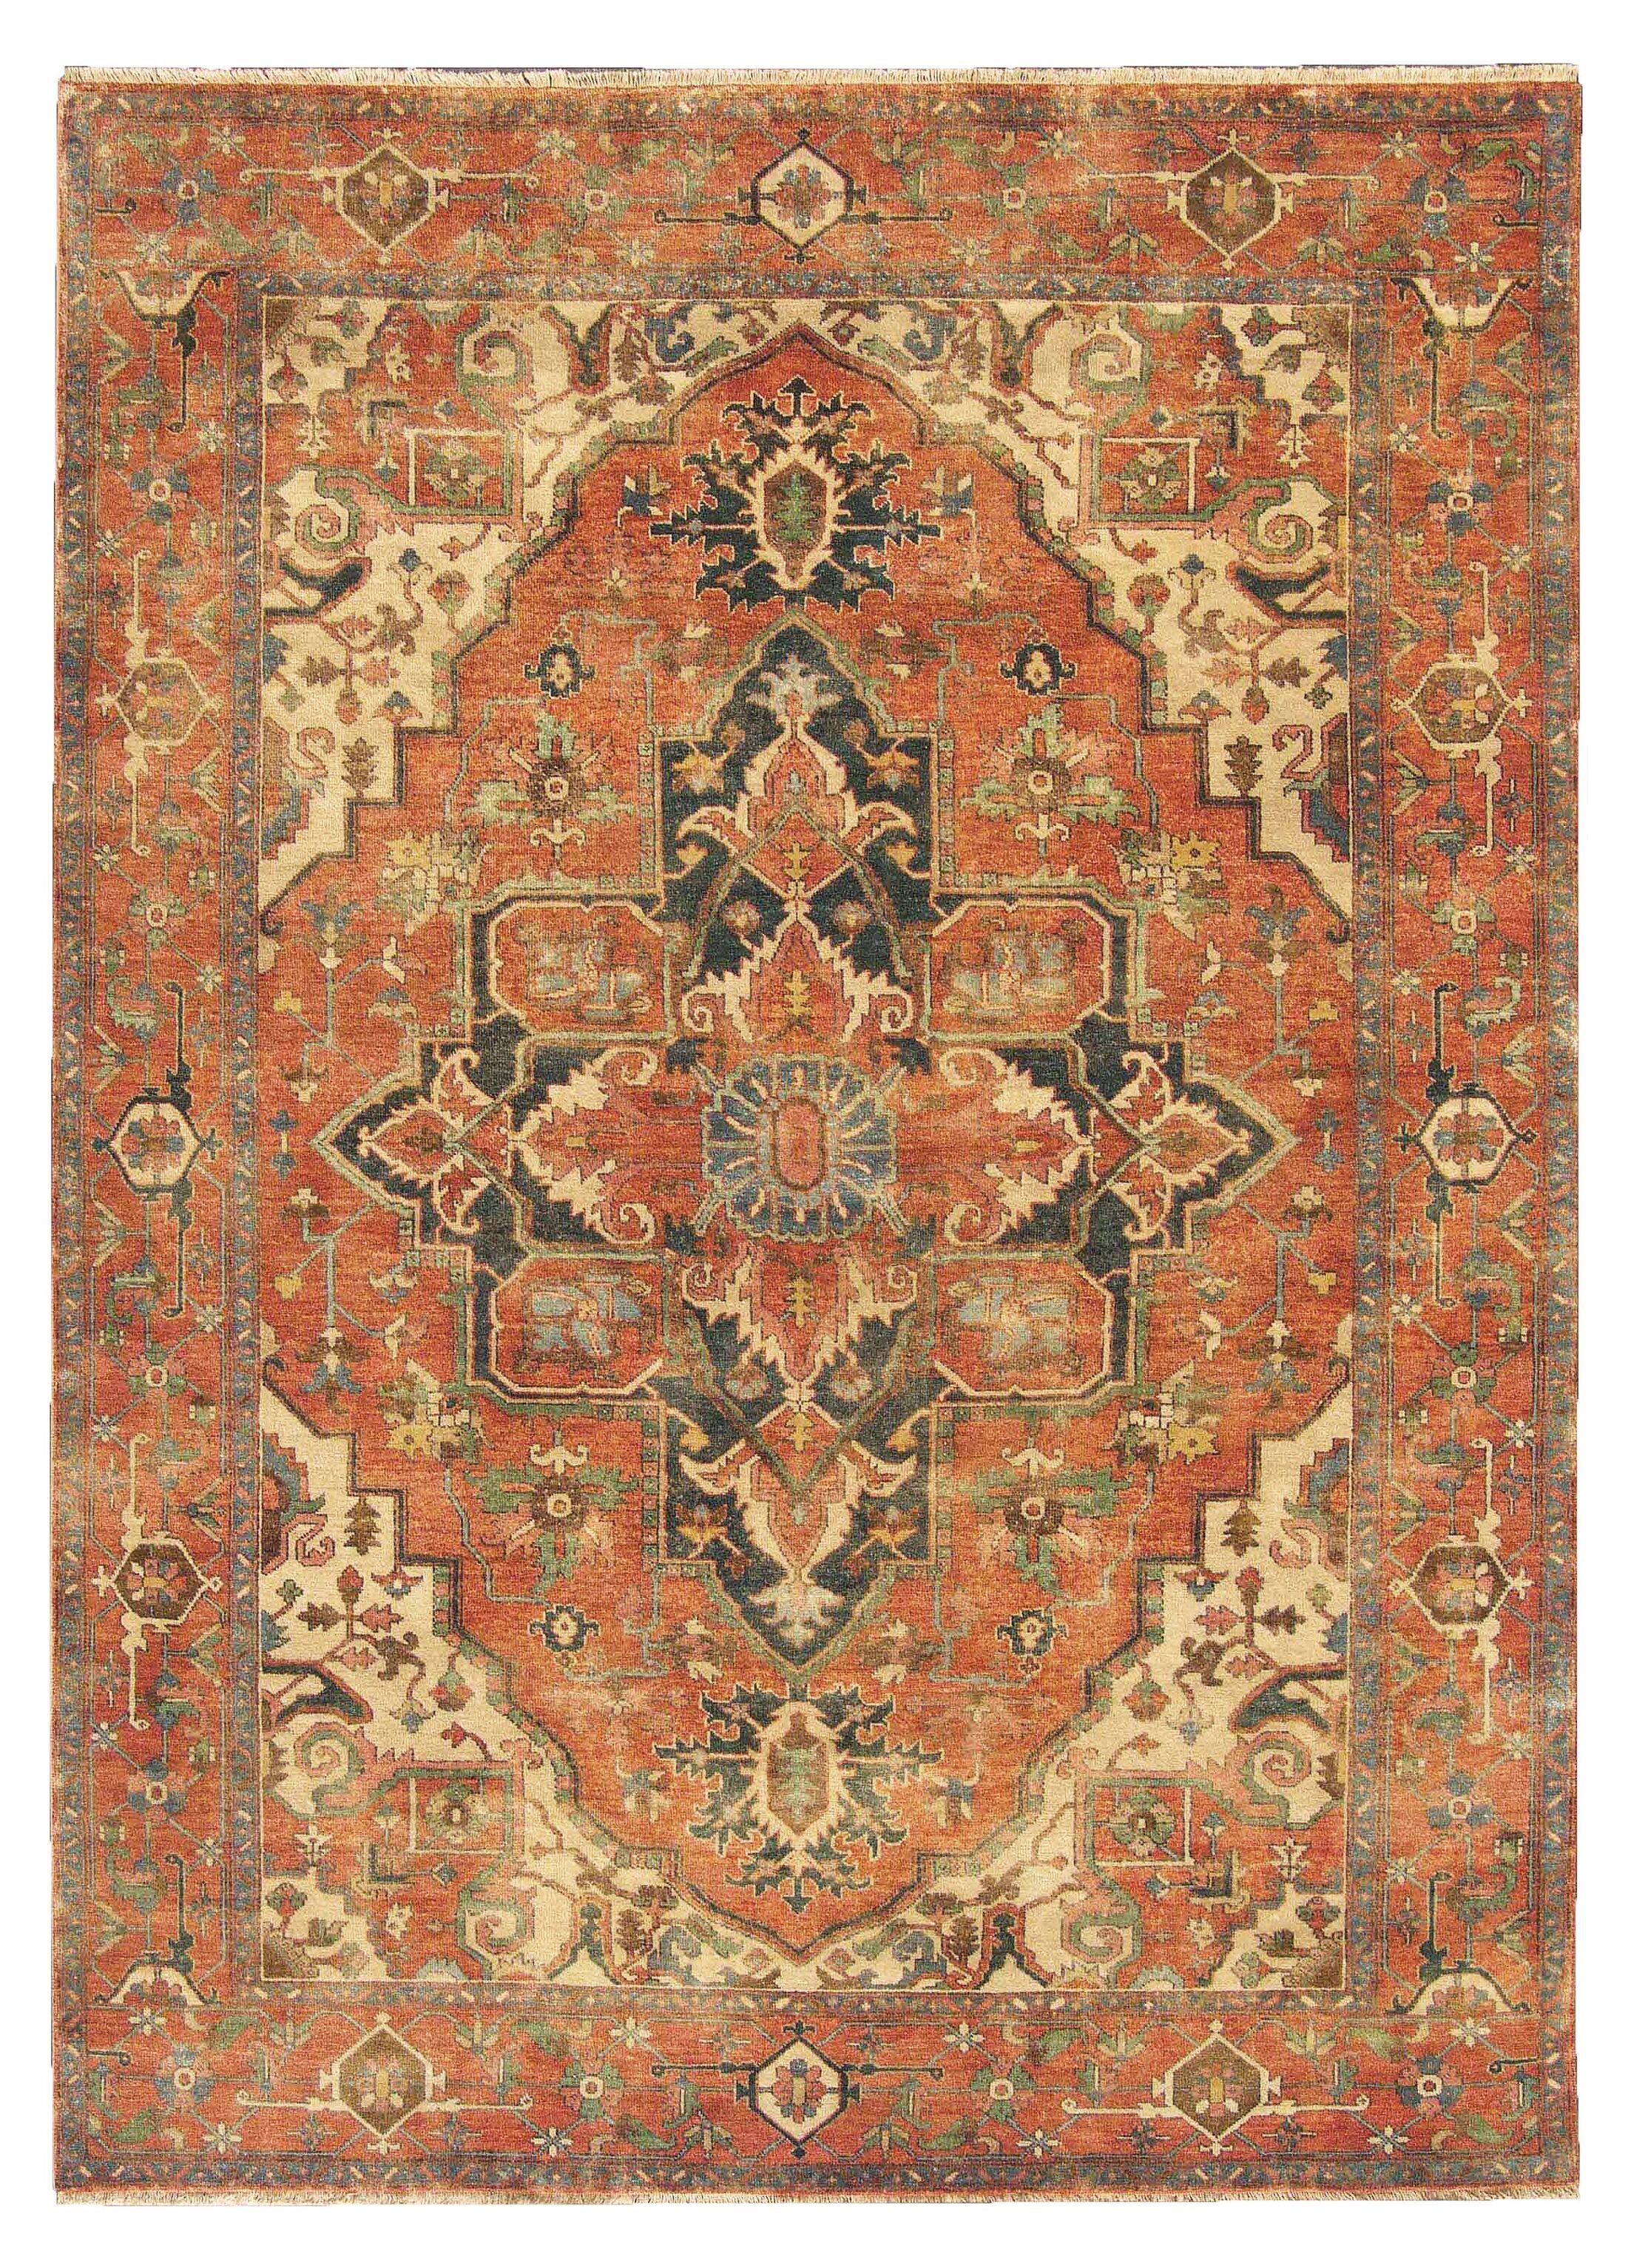 Serapi Hand-Knotted Wool Orange/Beige Area Rug Rug Size: 6' x 9'